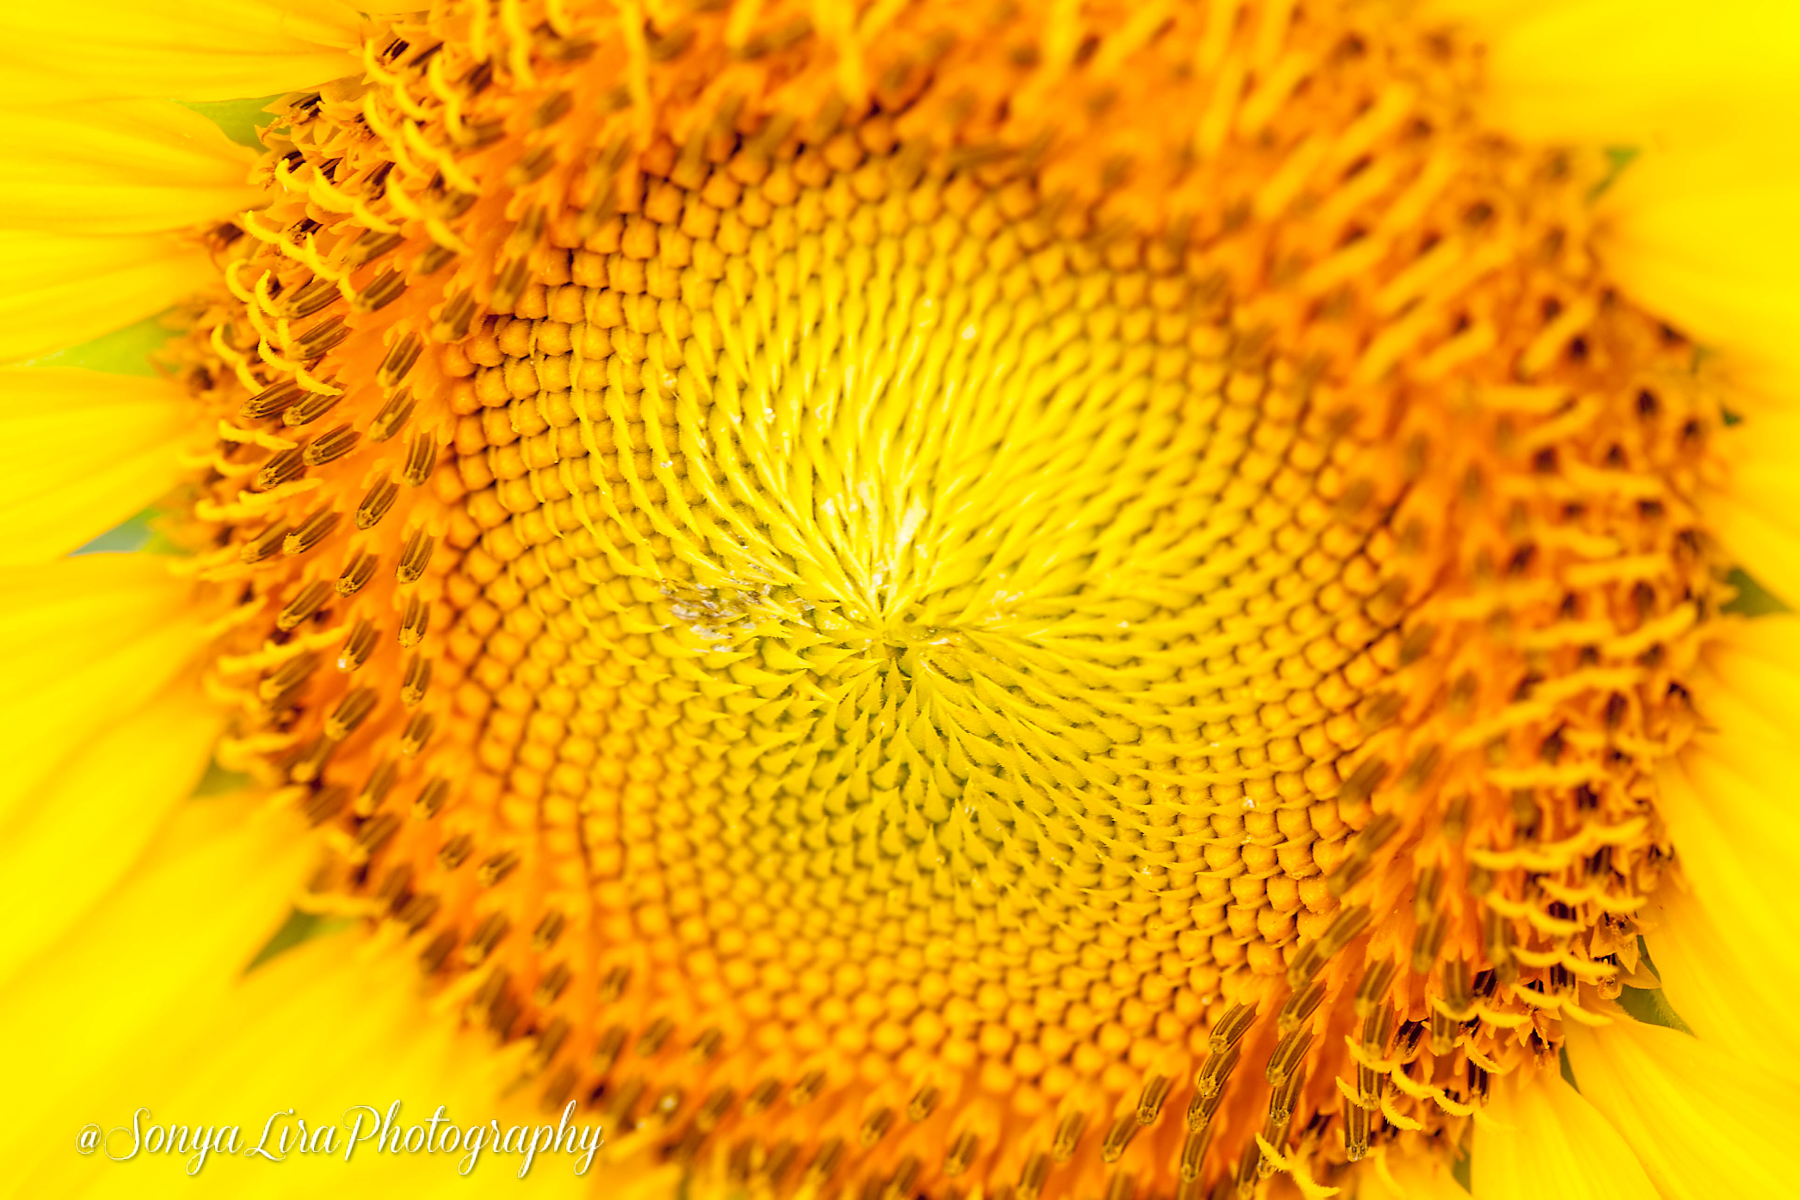 SonyaLiraPhotographySunflower3